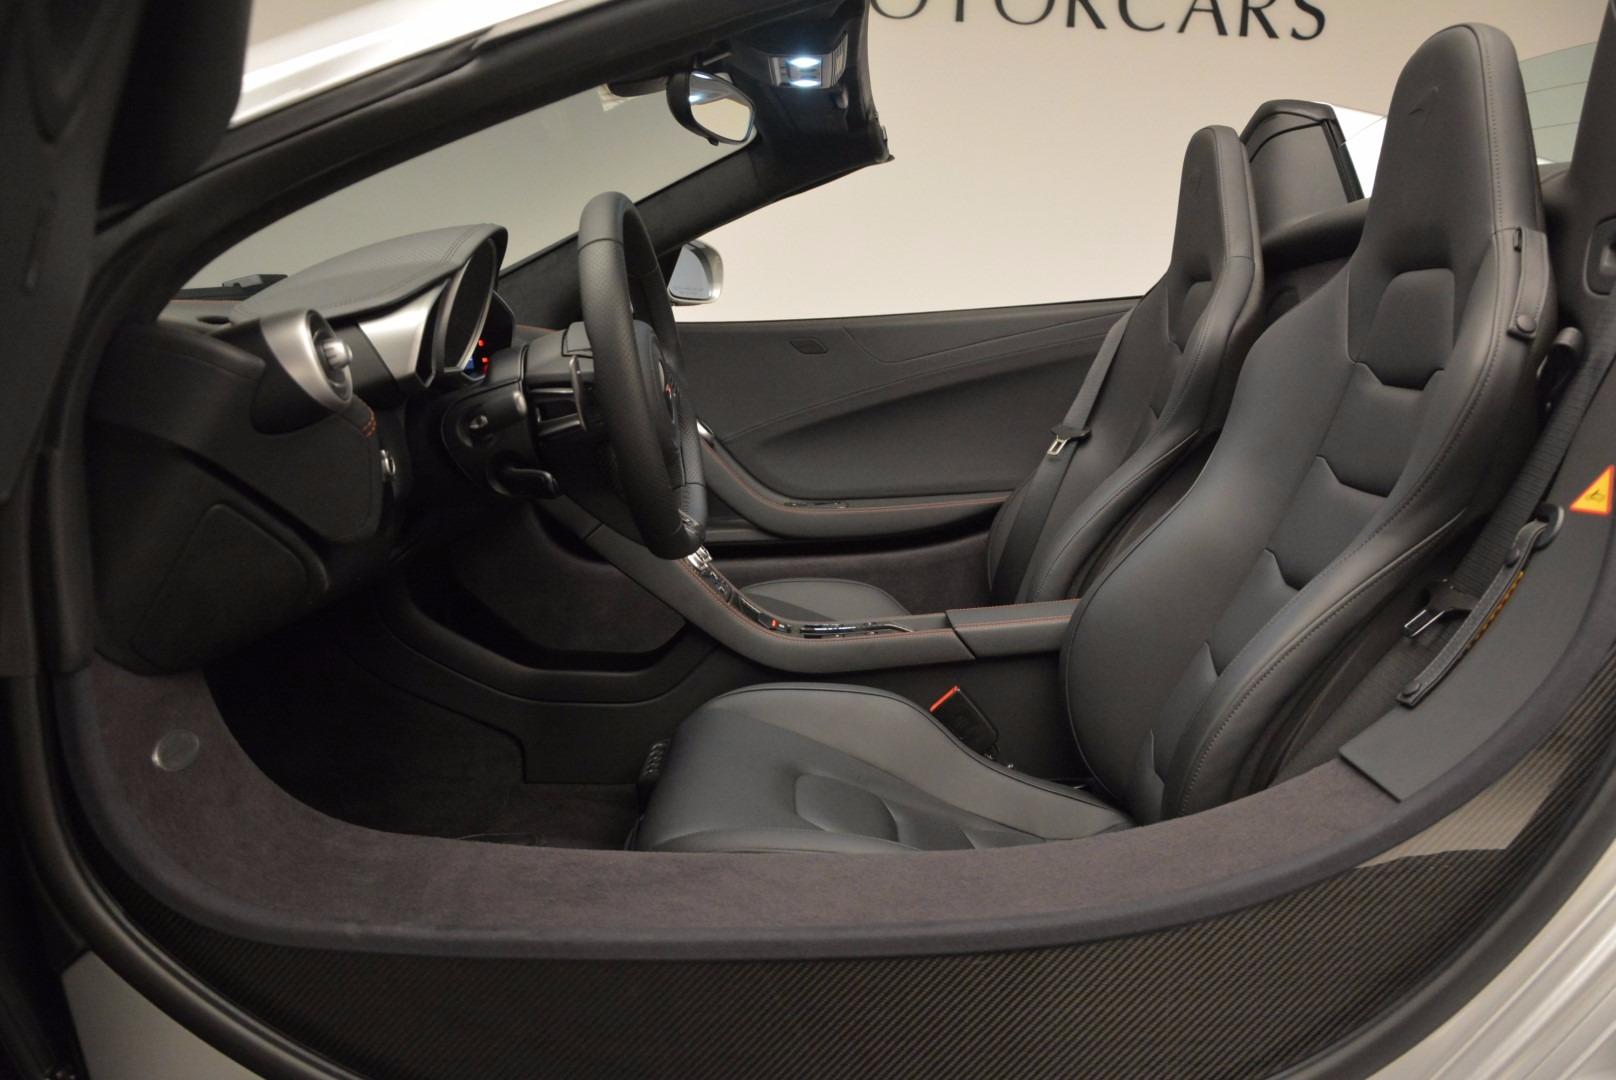 Used 2014 McLaren MP4-12C Spider  For Sale In Westport, CT 627_p23